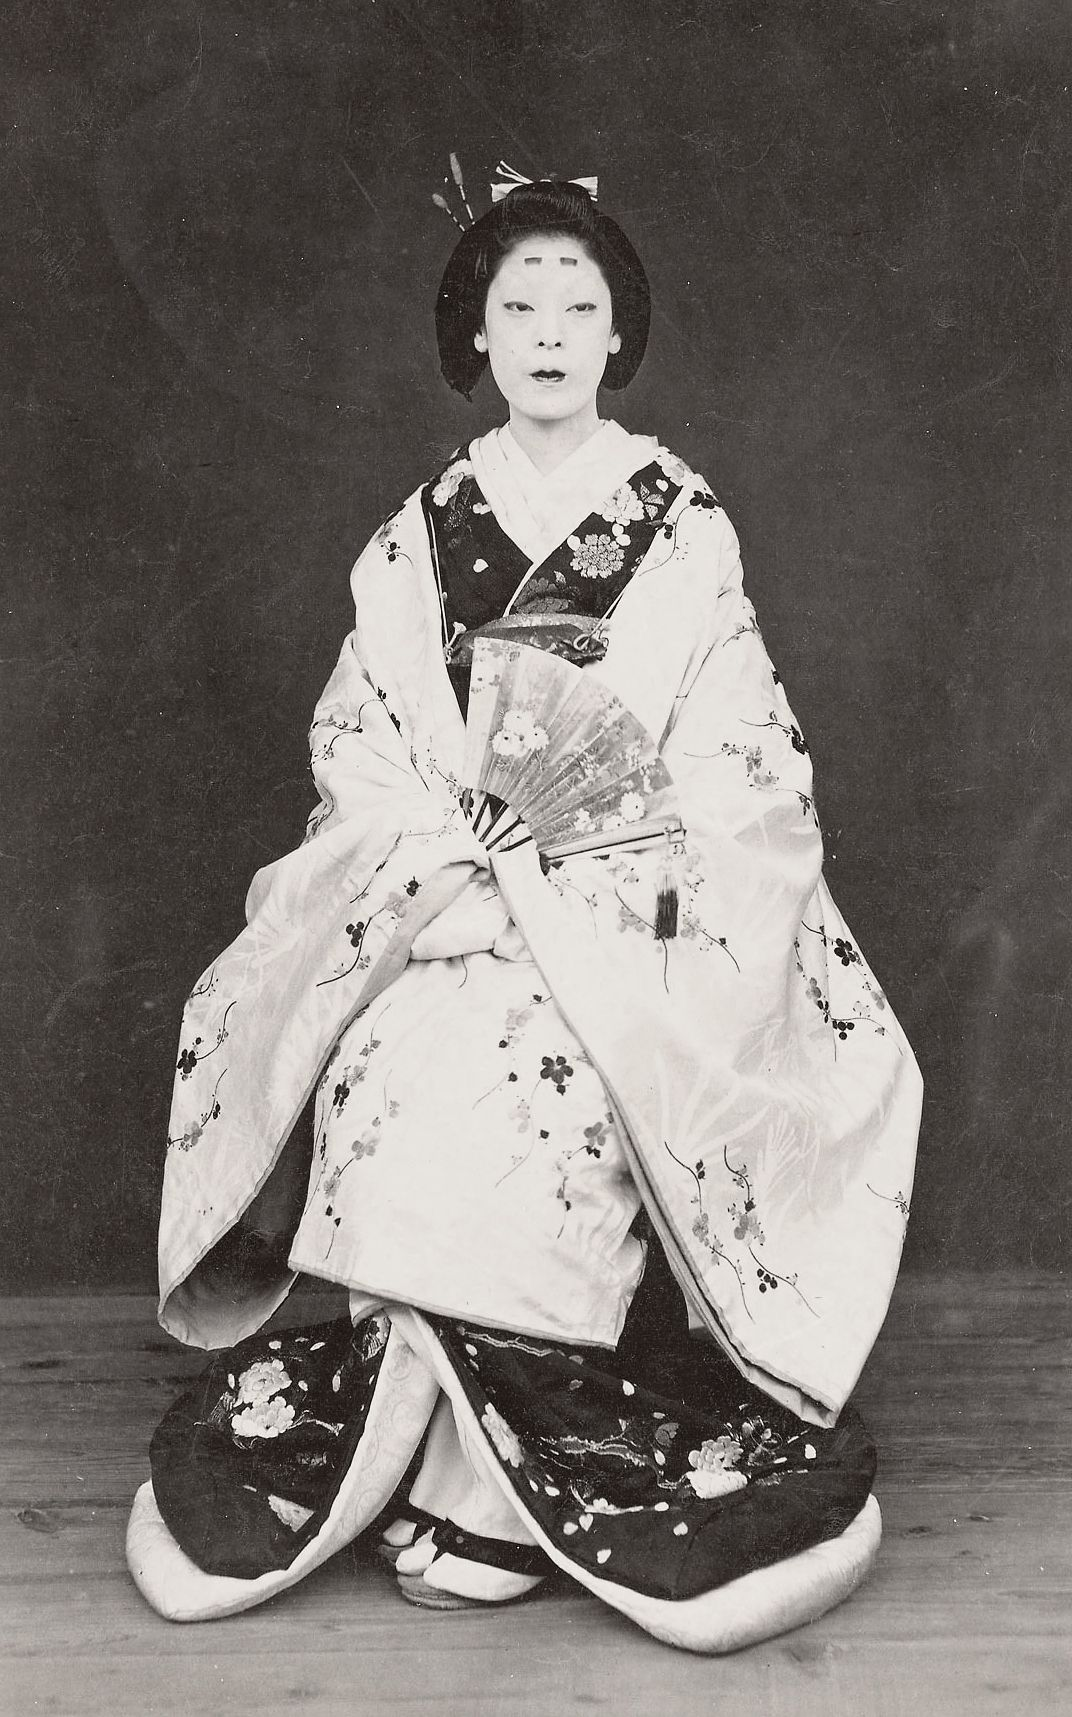 Woman In Formal Kimono. 1870 Japan. Smithsonian